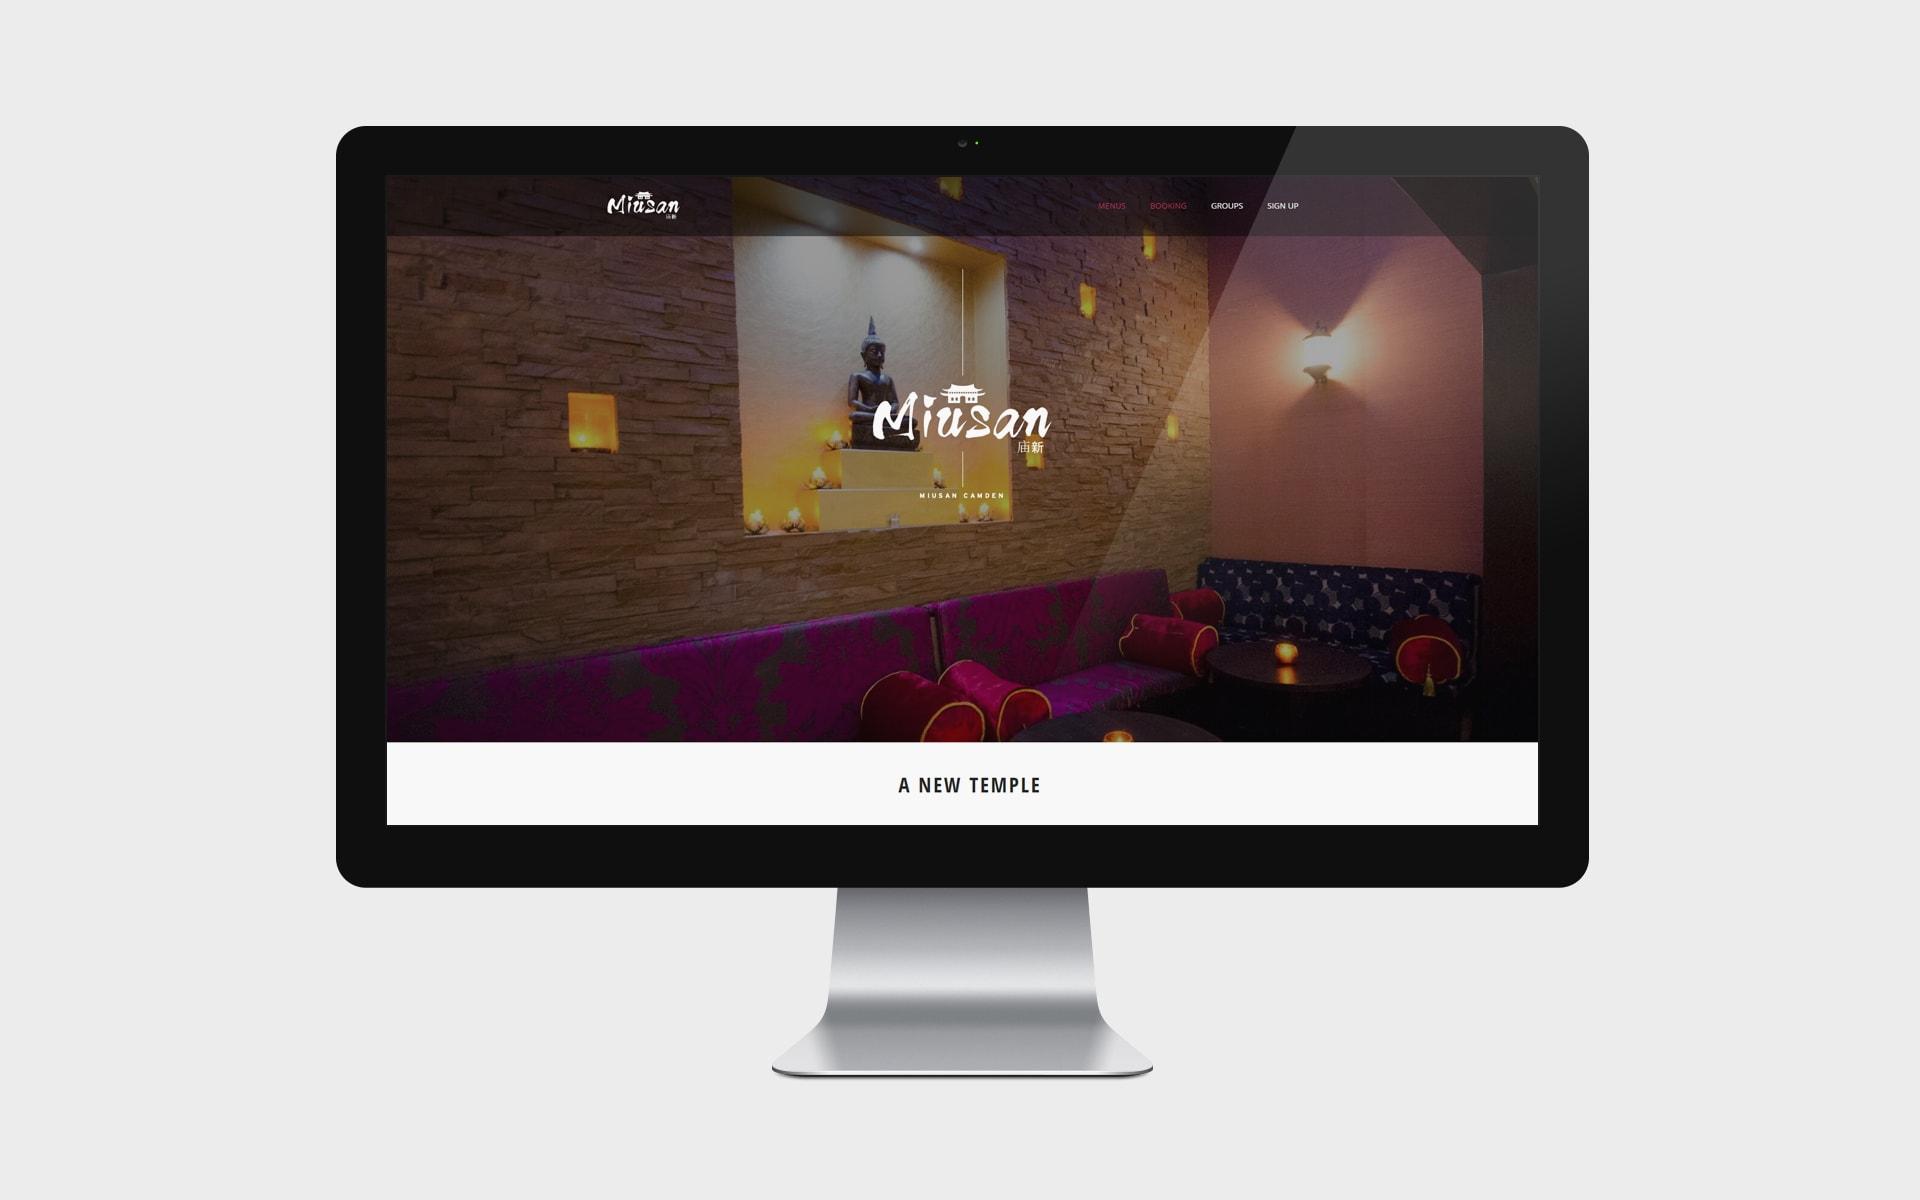 miusan website home